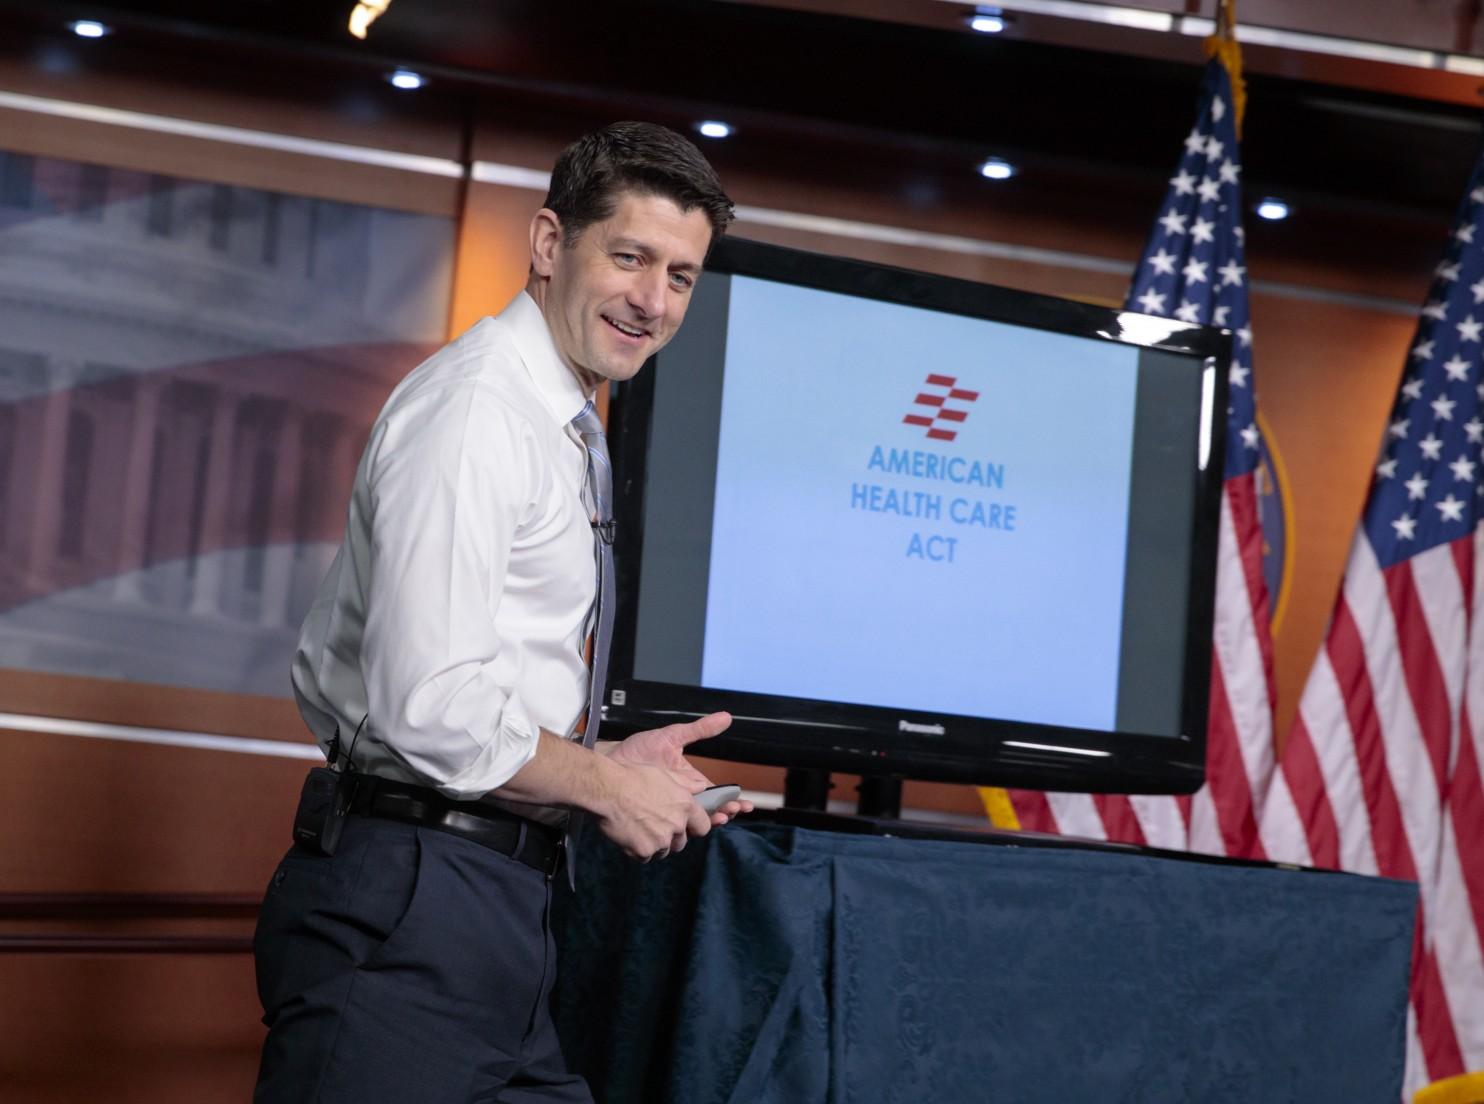 Congress_Health_Overhaul_82379-68bc5-2113.jpg